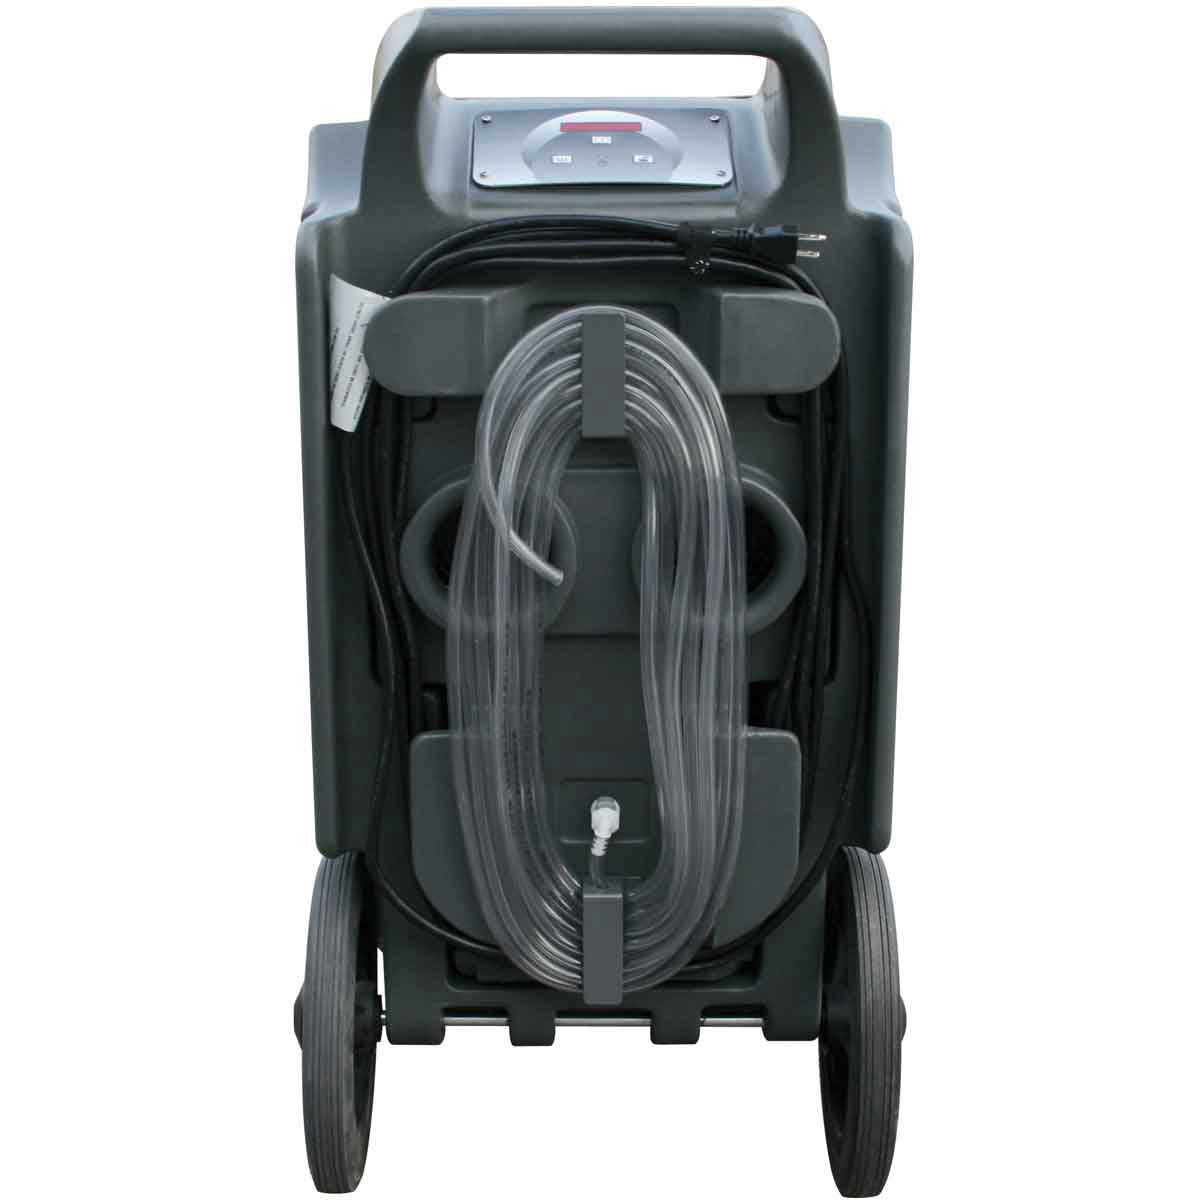 5200000302 Portable Dehumidifiers Wacker Neuson